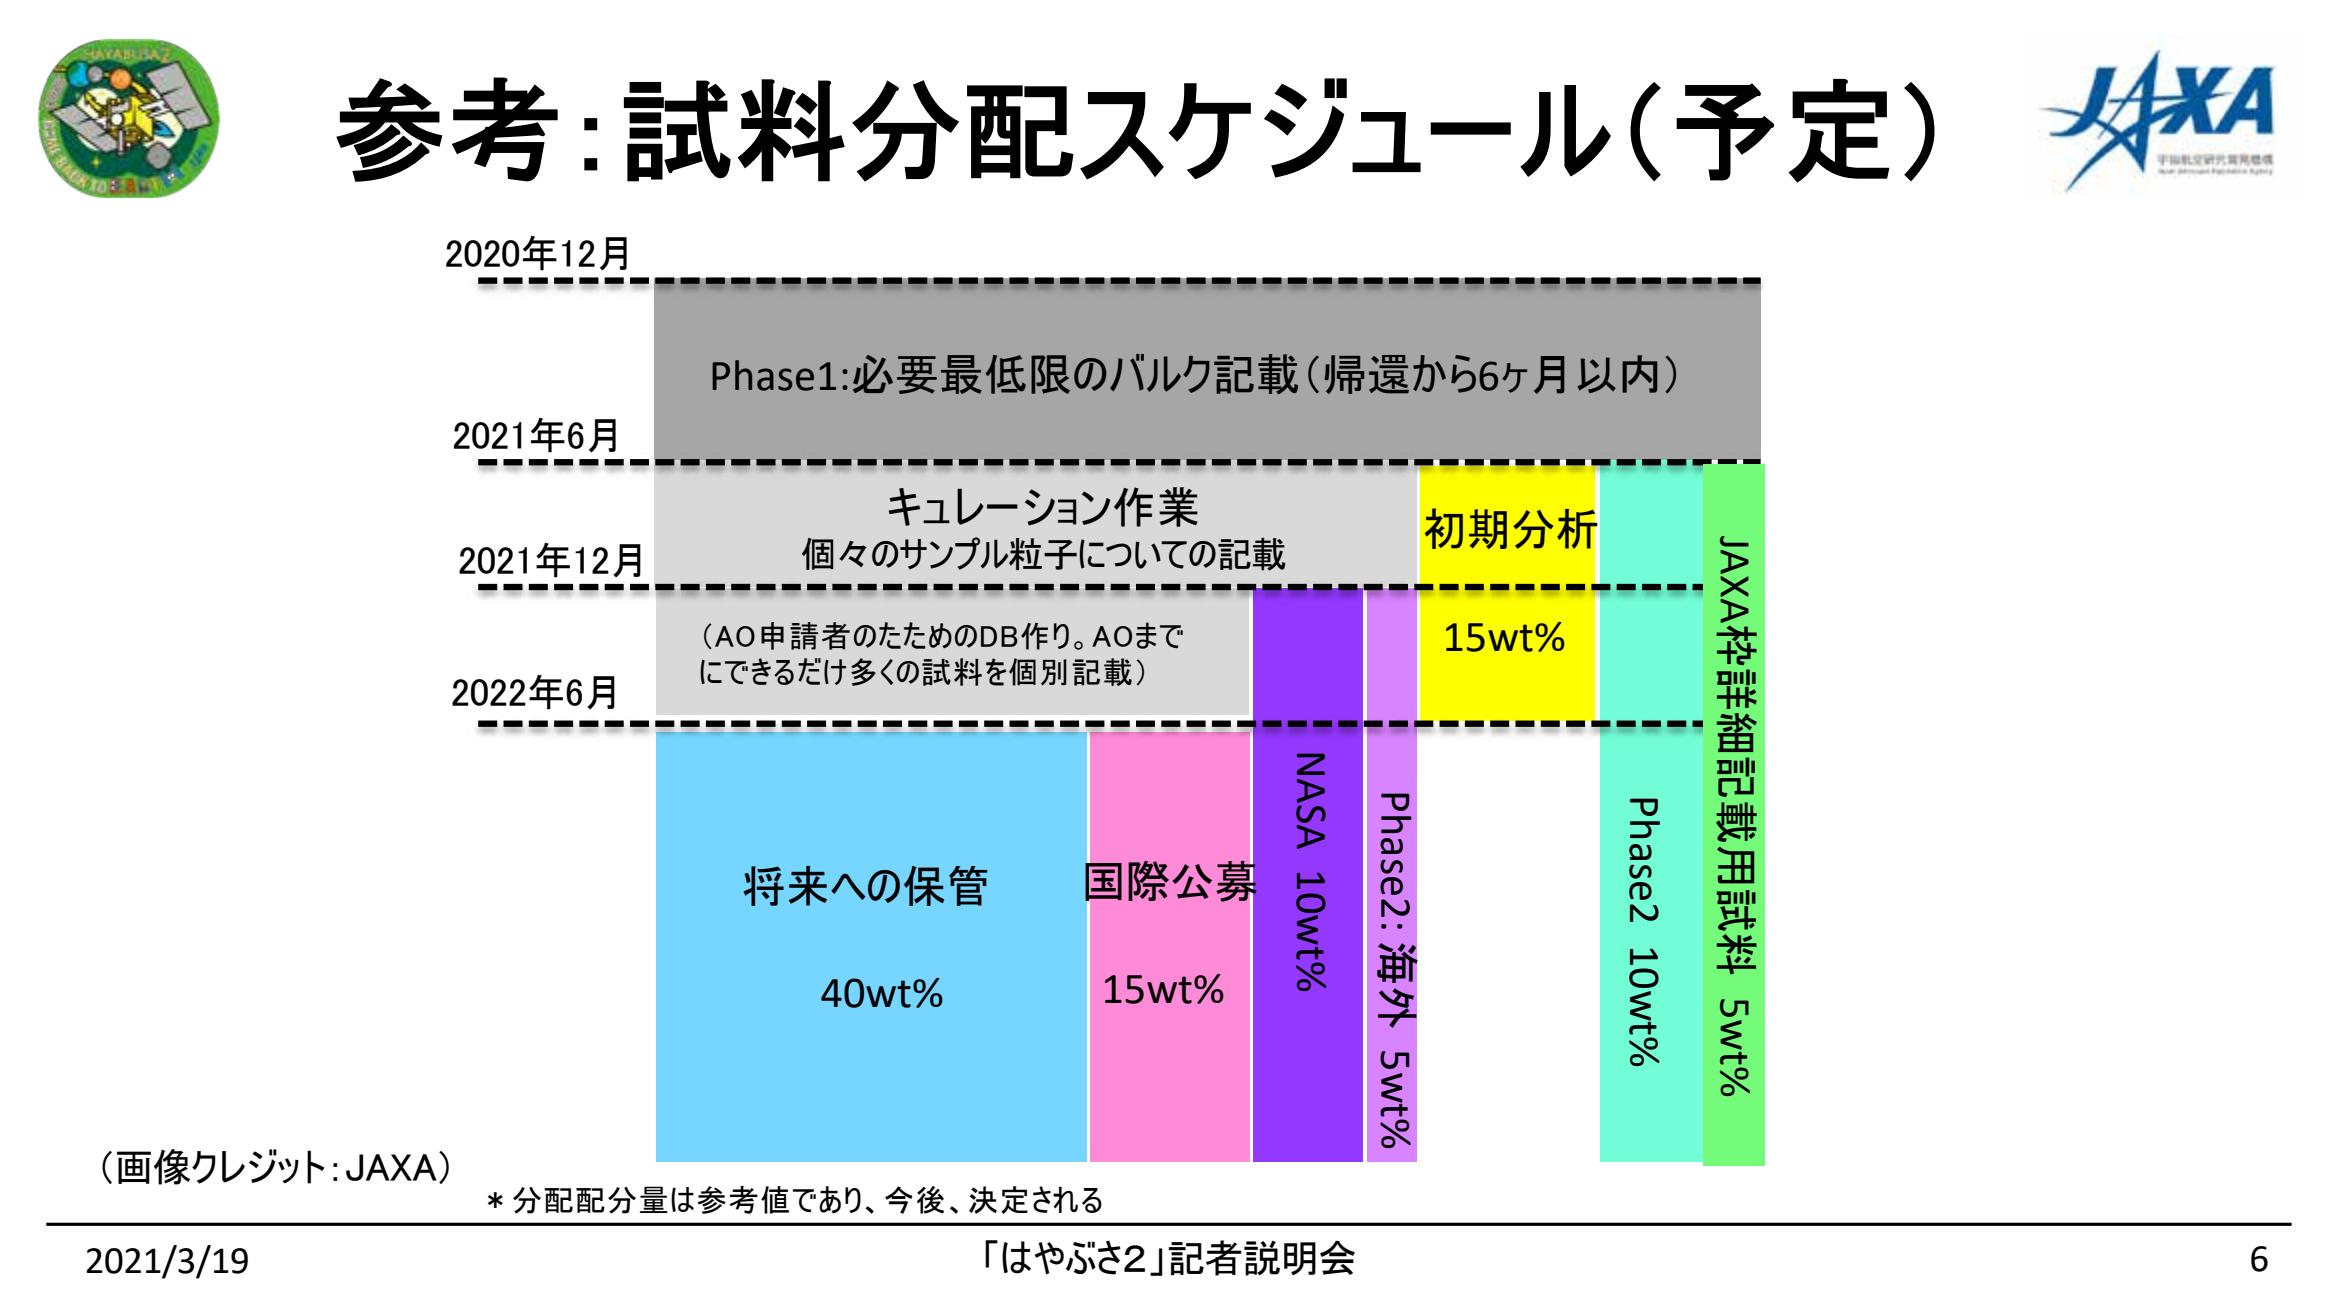 f:id:Imamura:20210319144424p:image